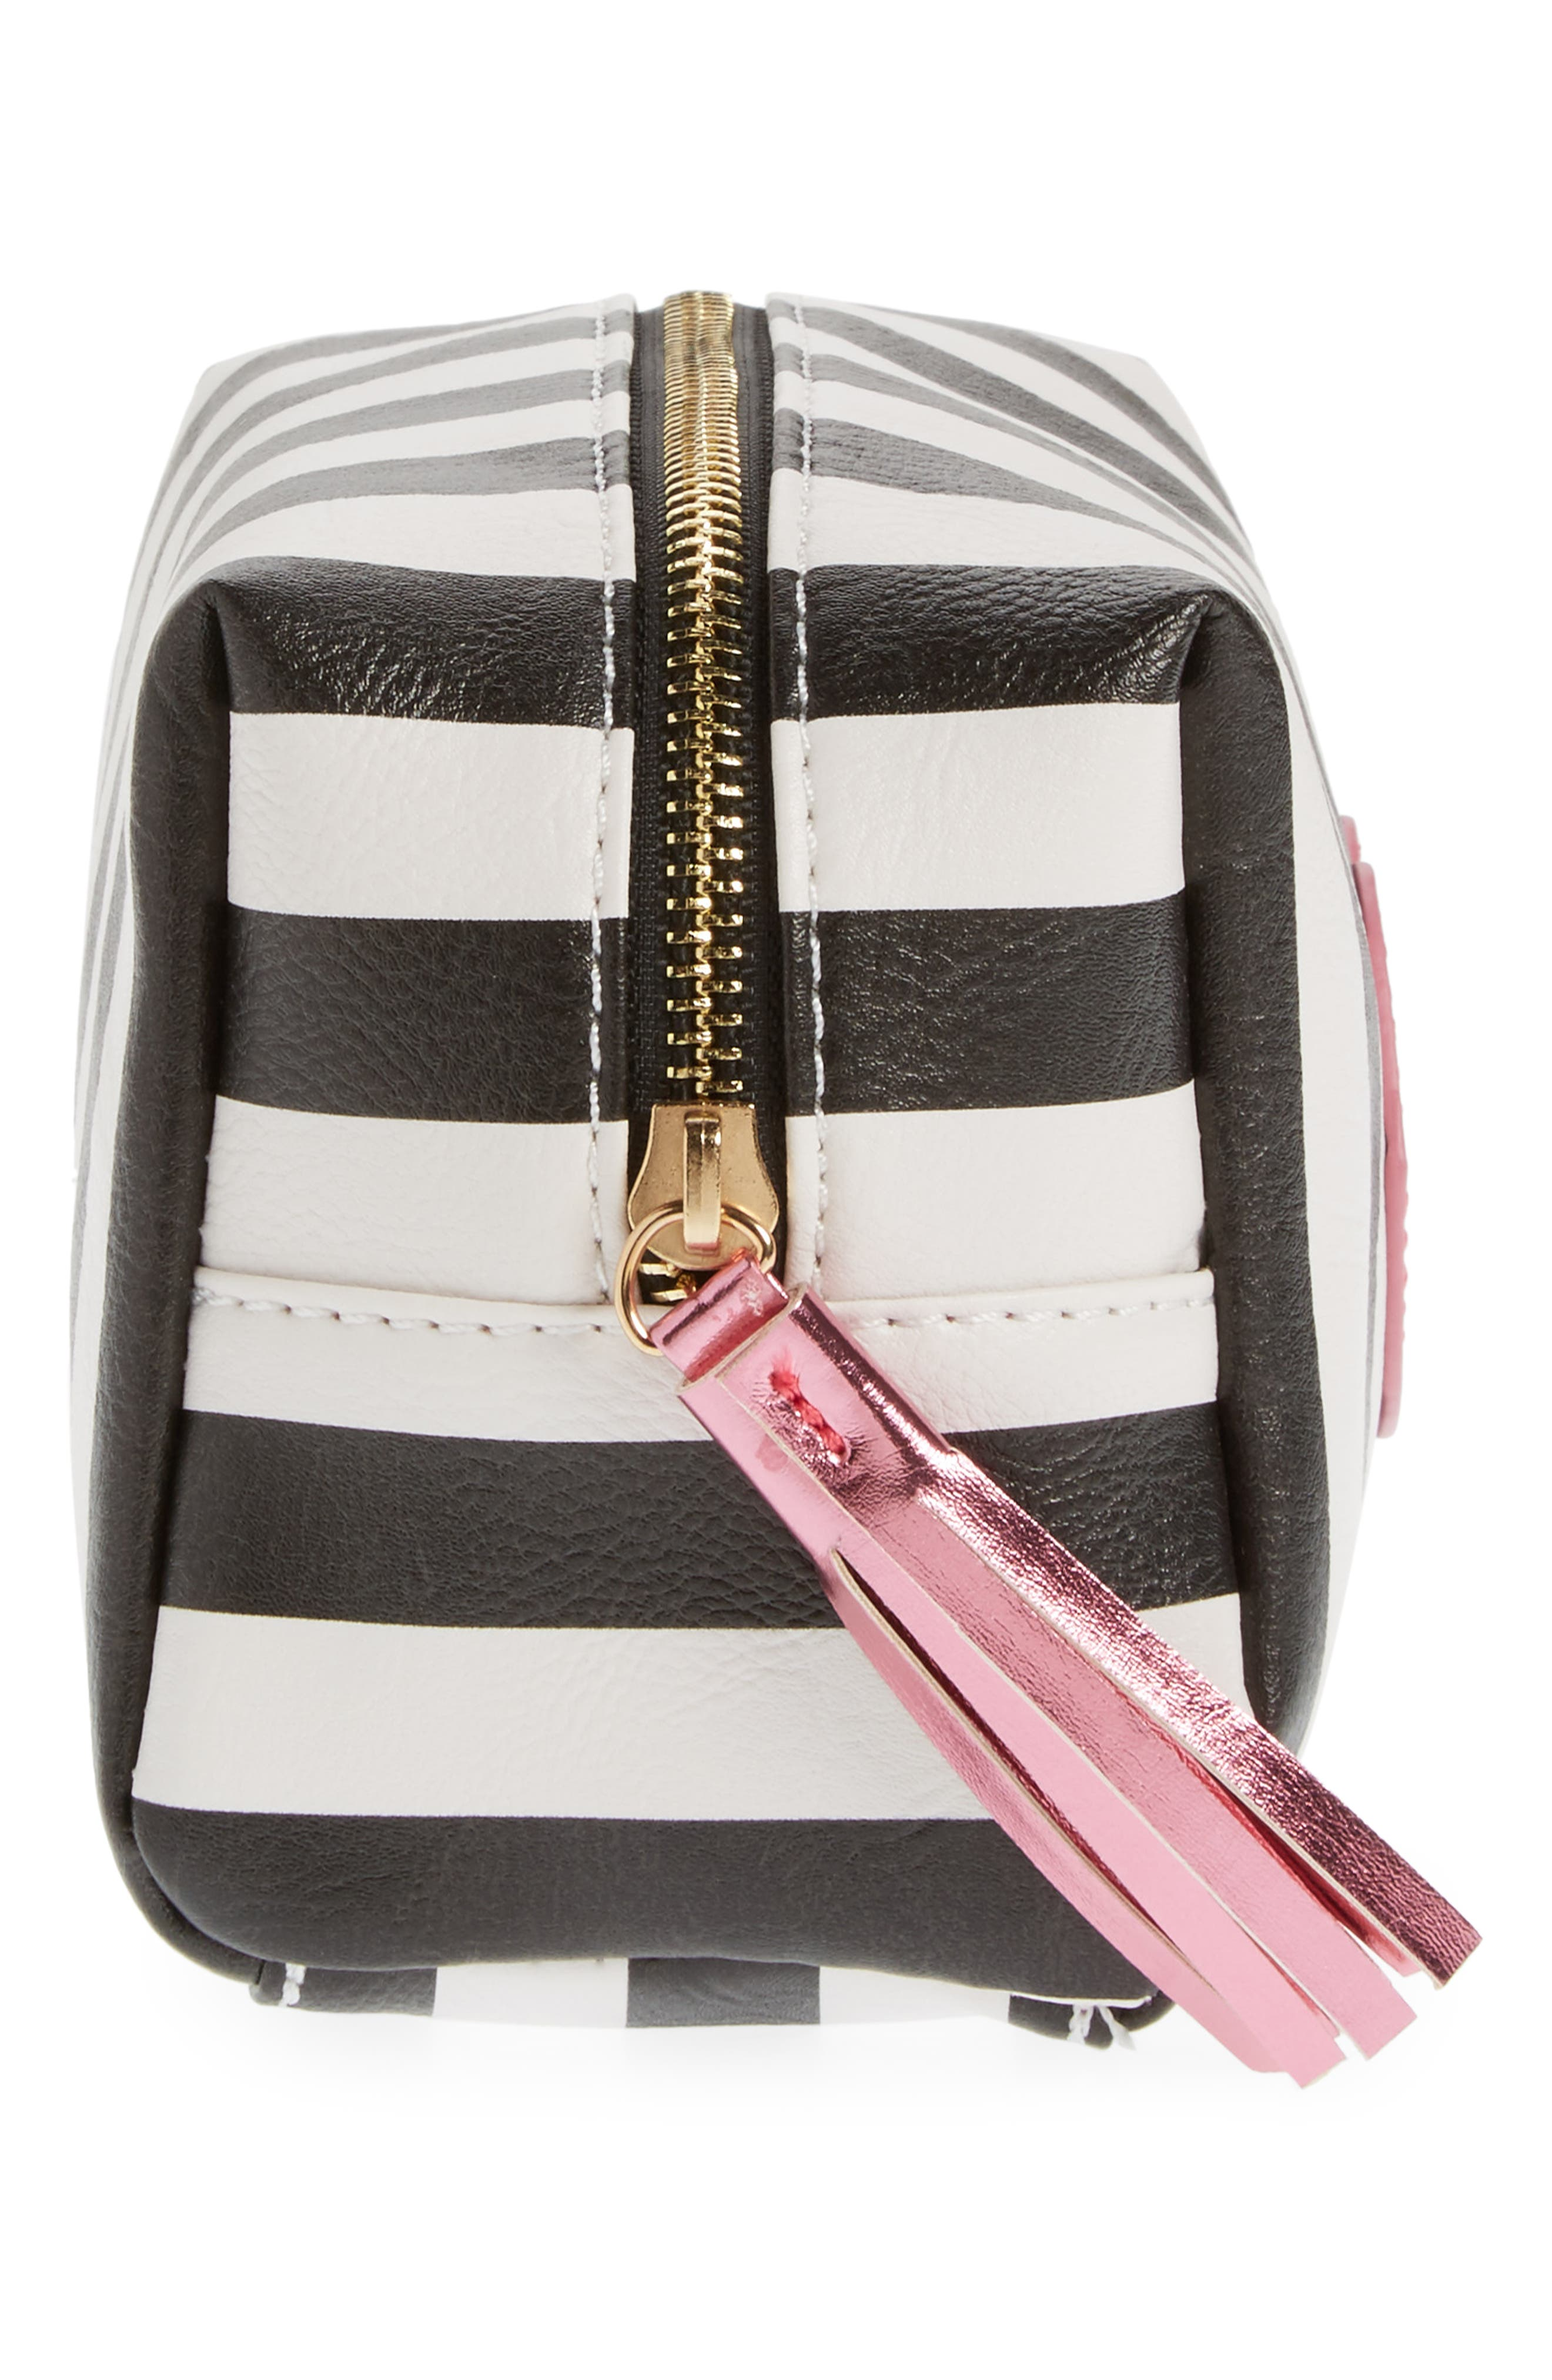 Metallic Lip Stripe Cosmetics Bag,                             Alternate thumbnail 4, color,                             Black/ White